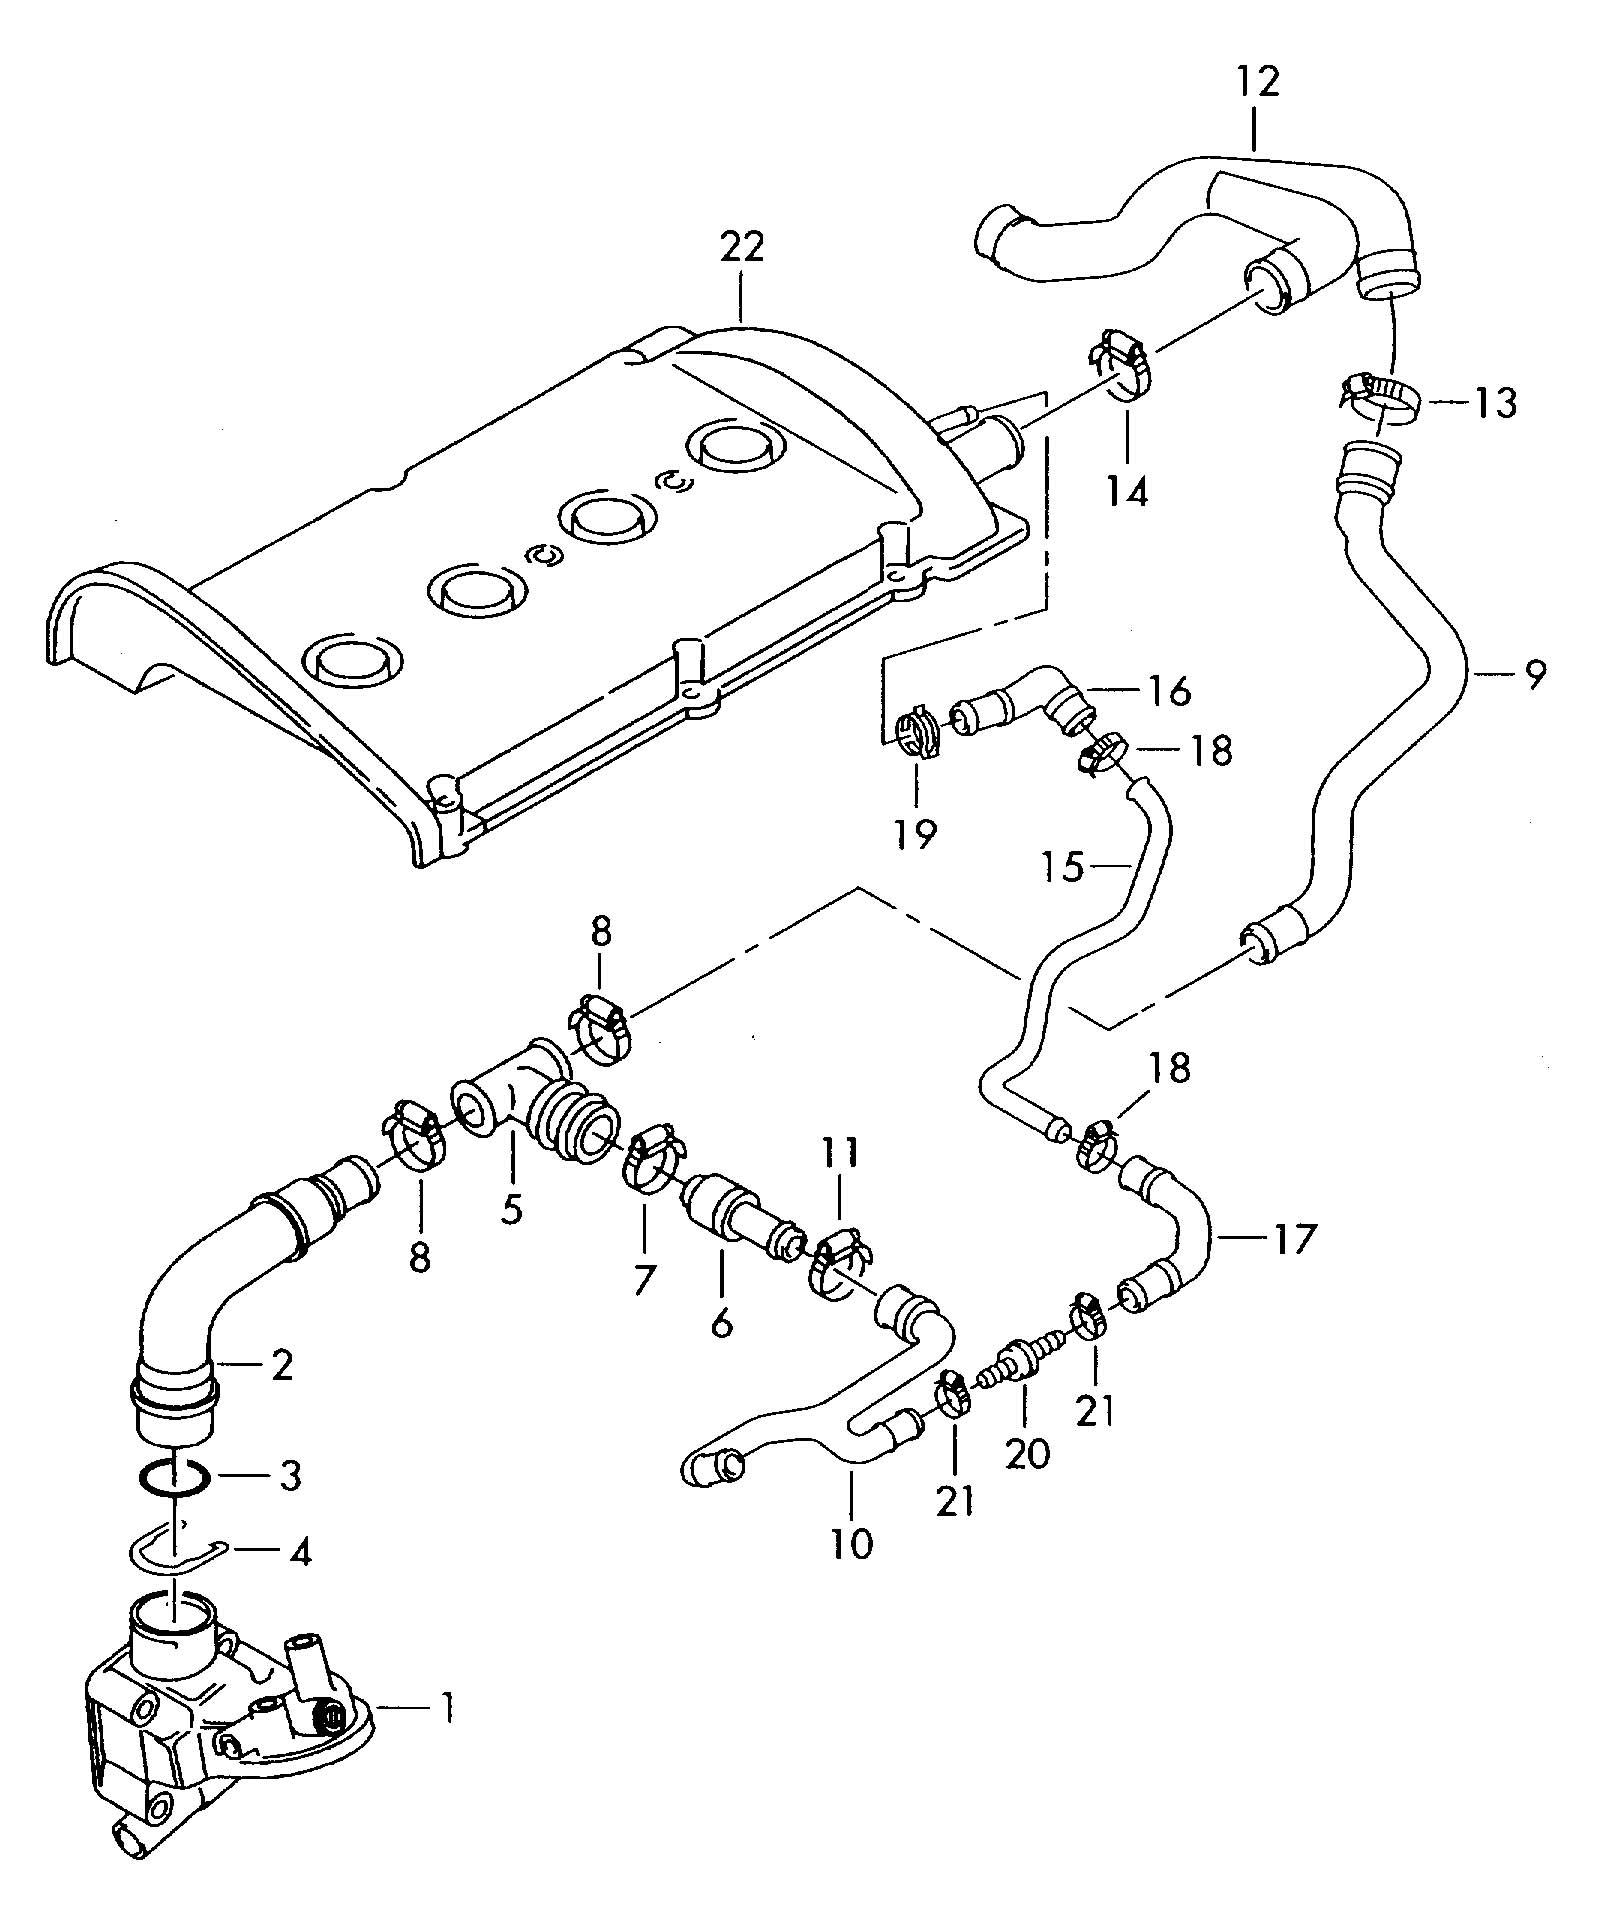 hight resolution of crankcase pcv system